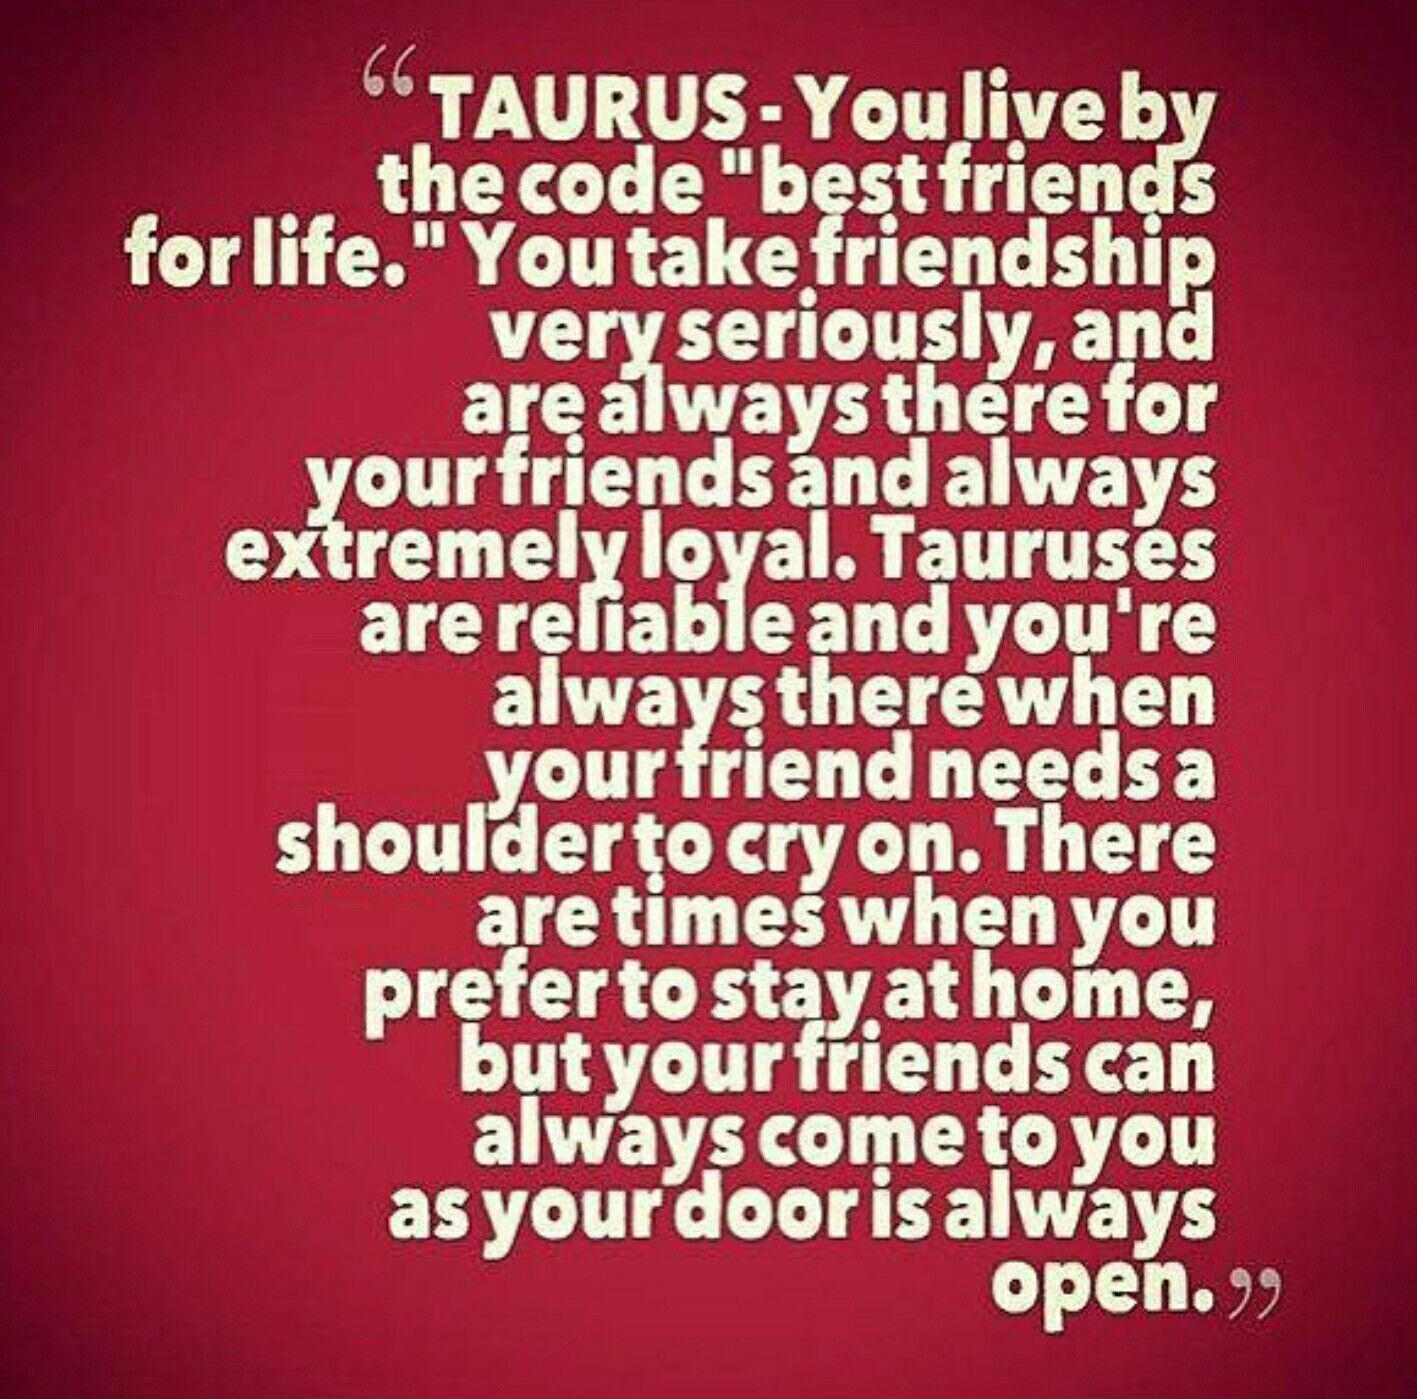 NICHOLE: Taurus and taurus friendship